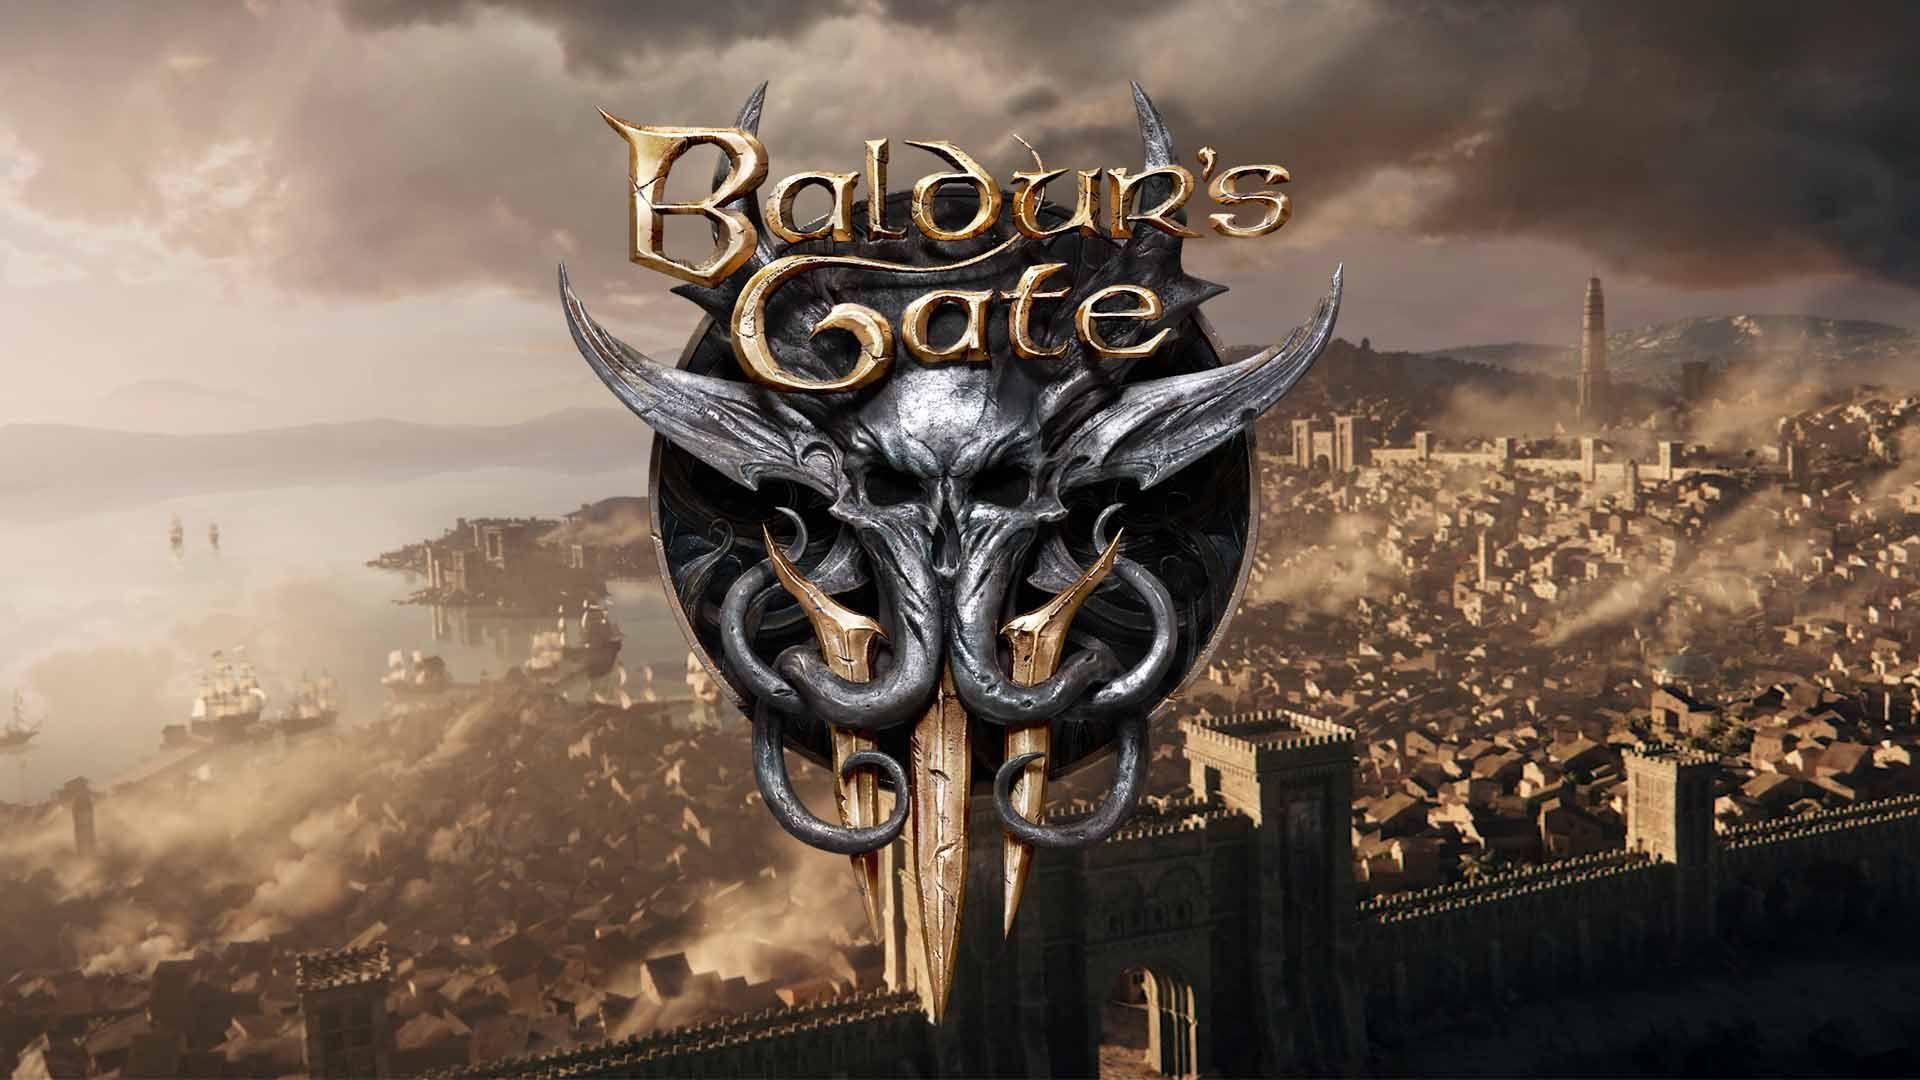 Baldur's-gate-3-patch-4